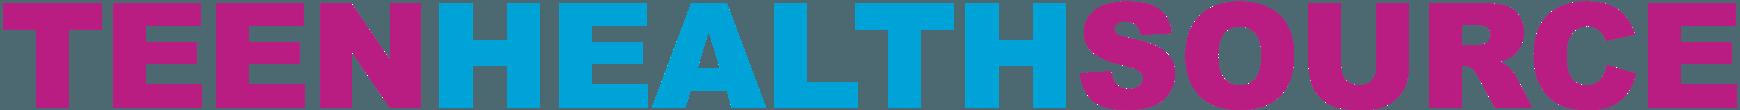 teen health source logo